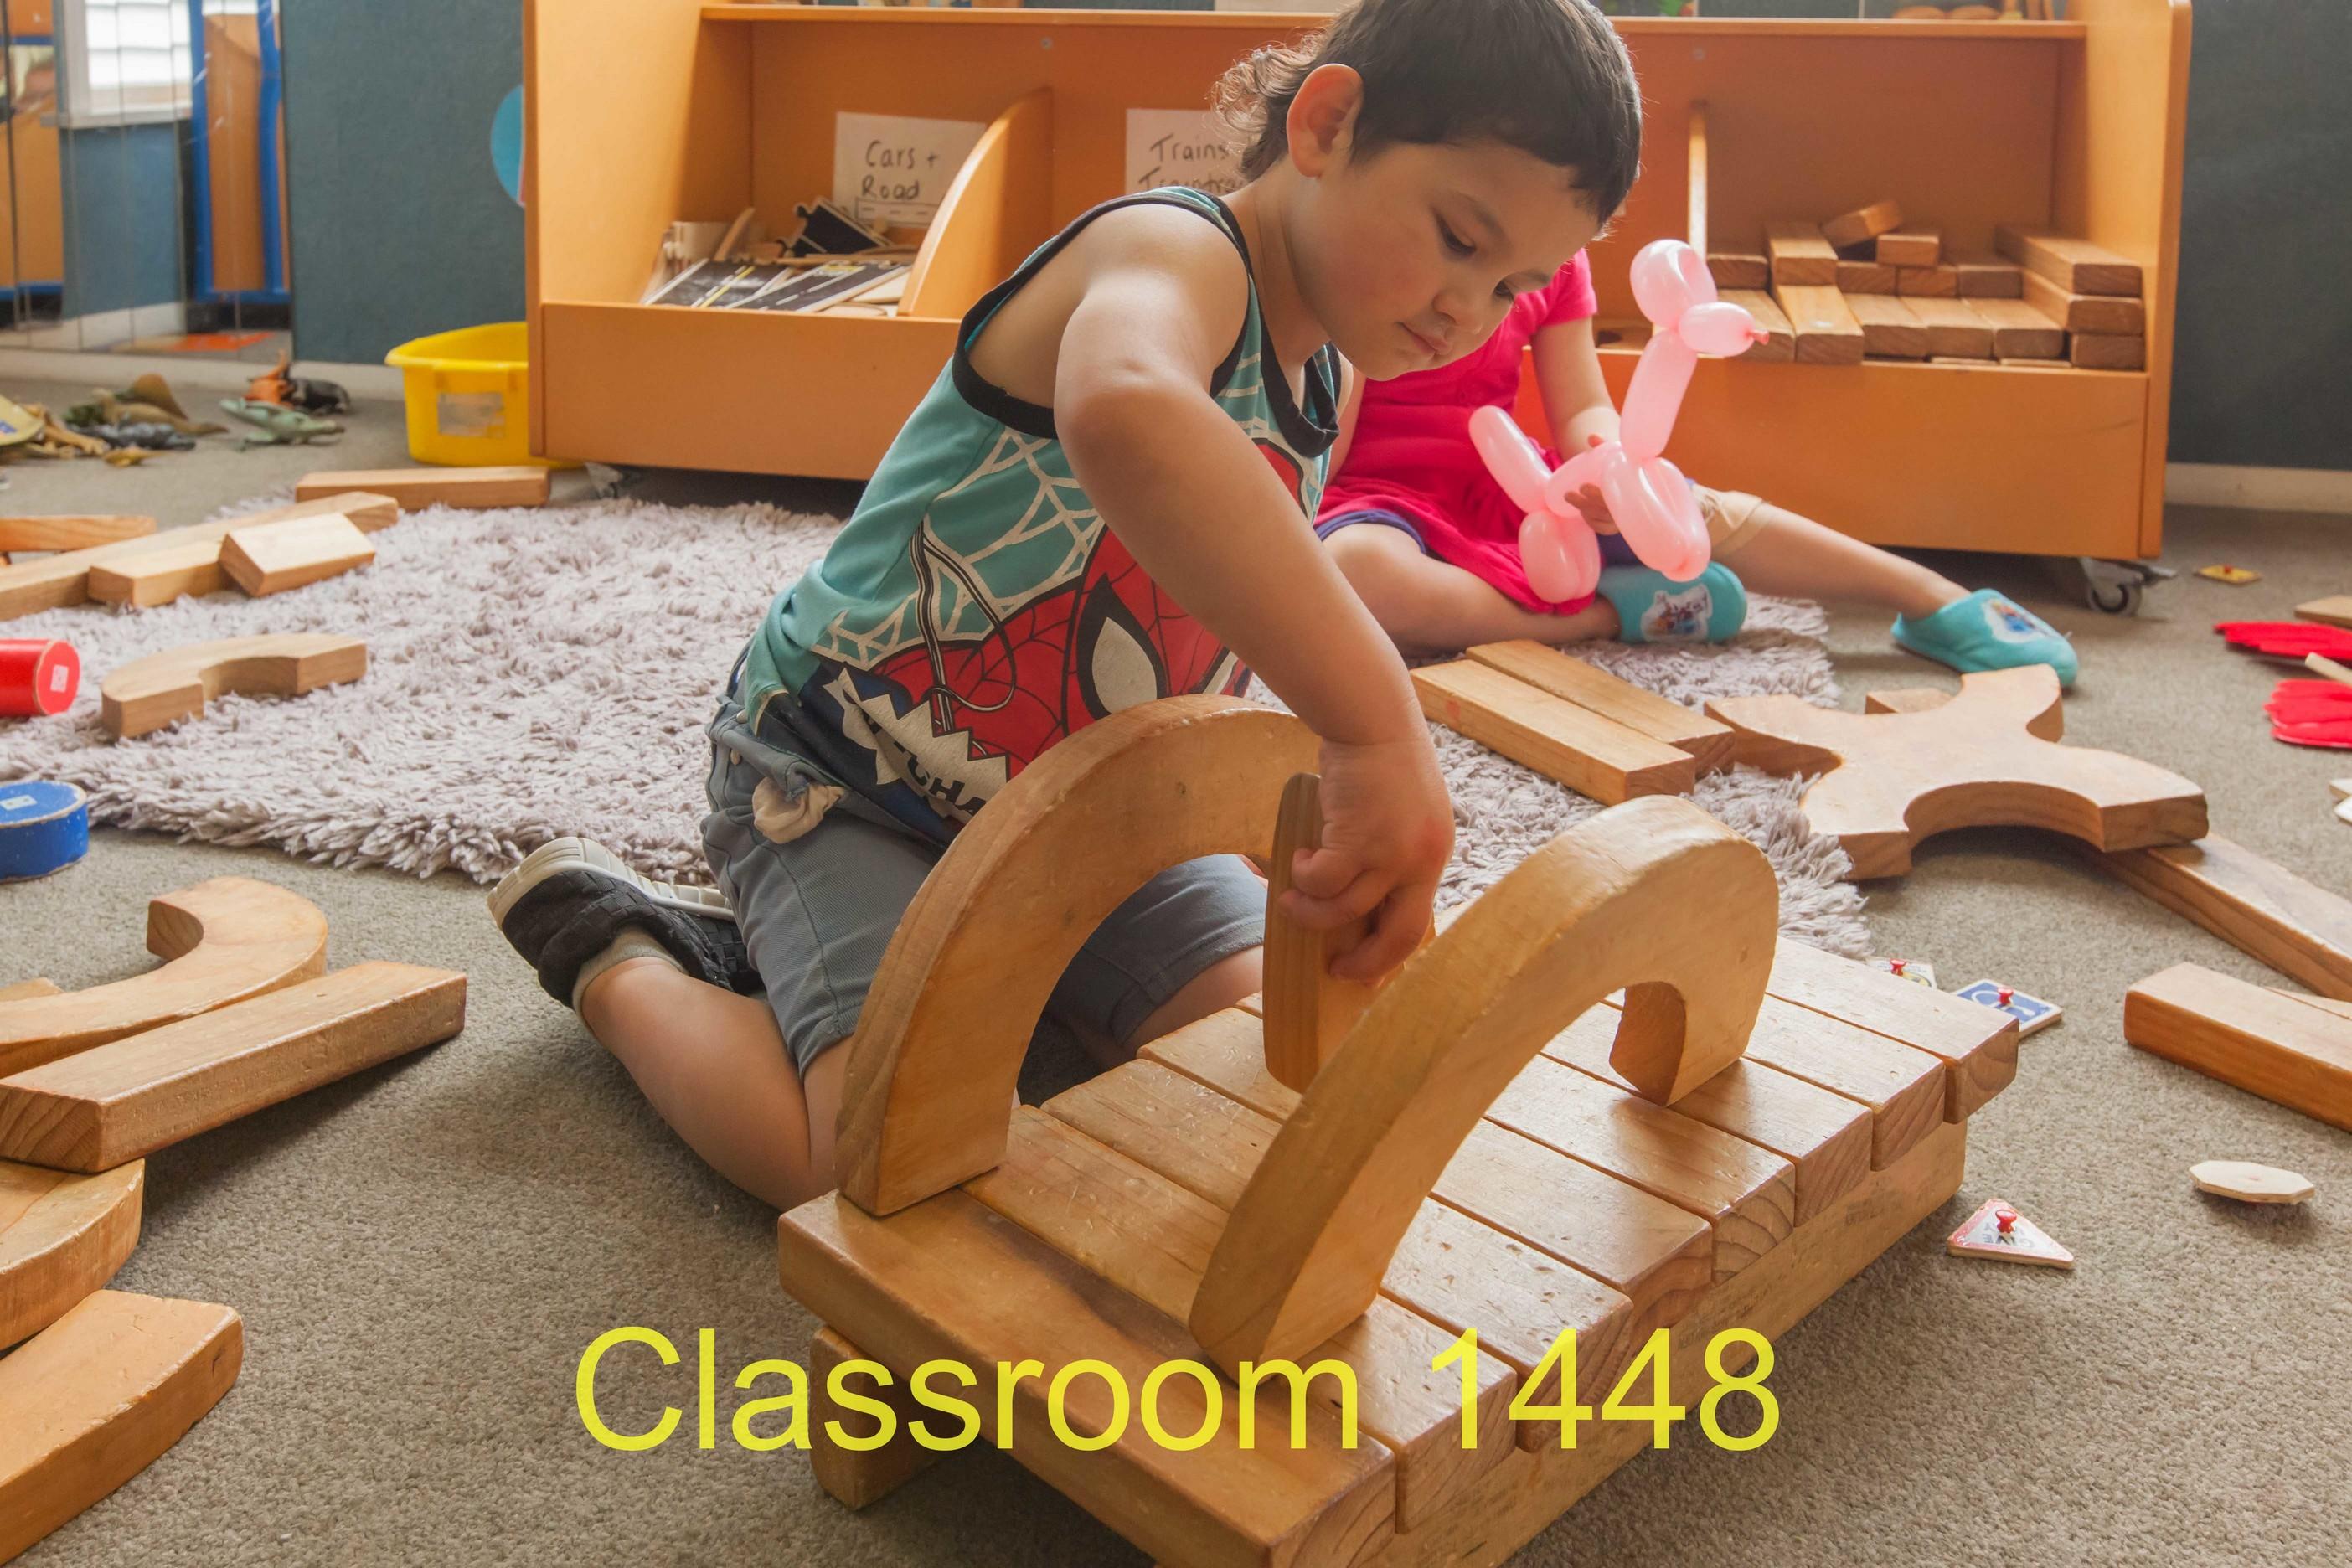 Classroom 1448